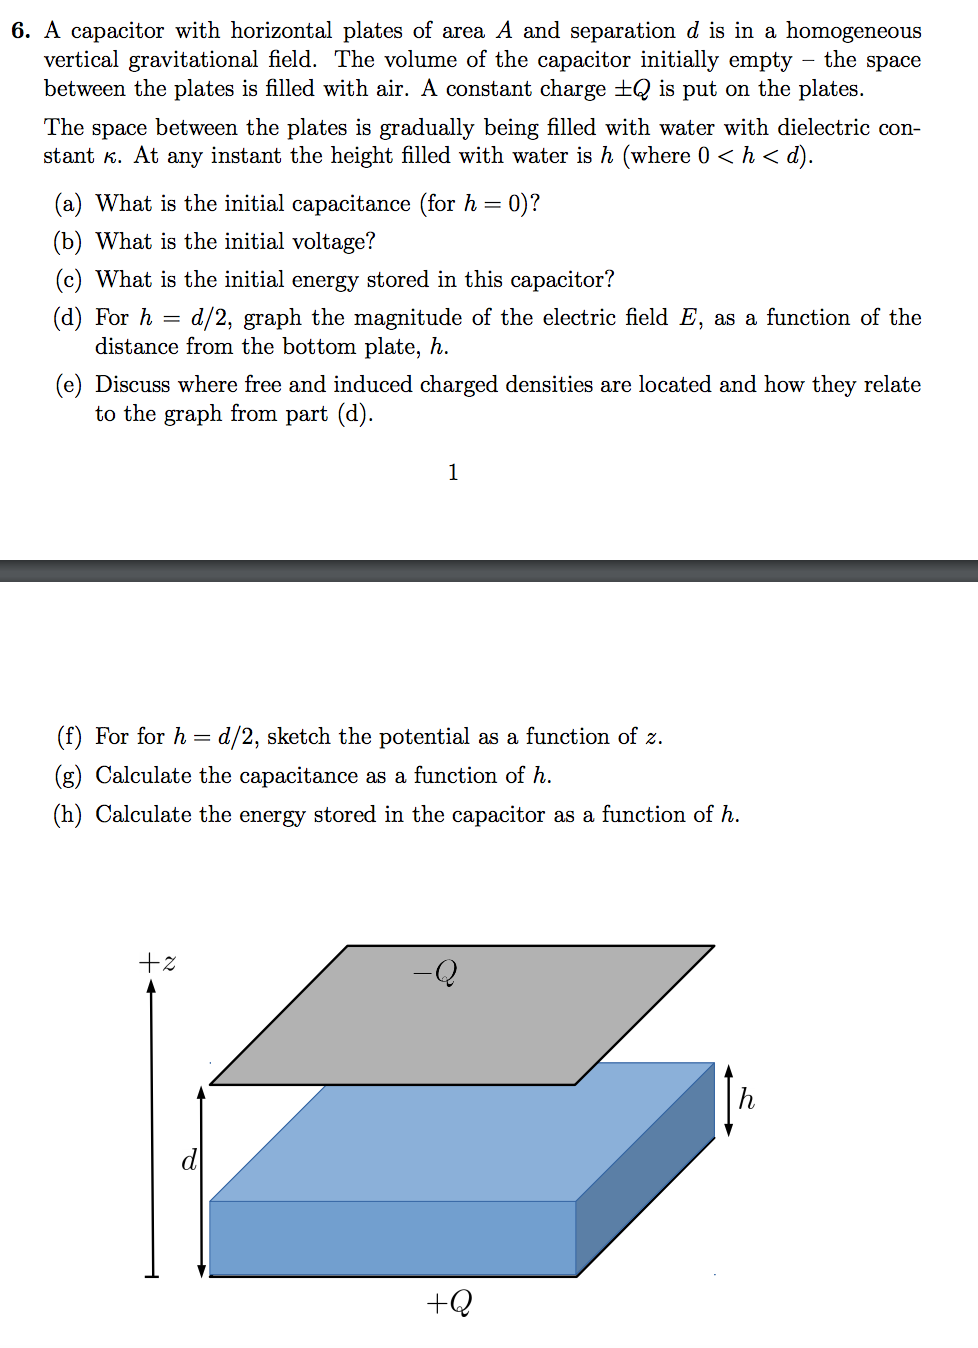 www.chegg.com homework help